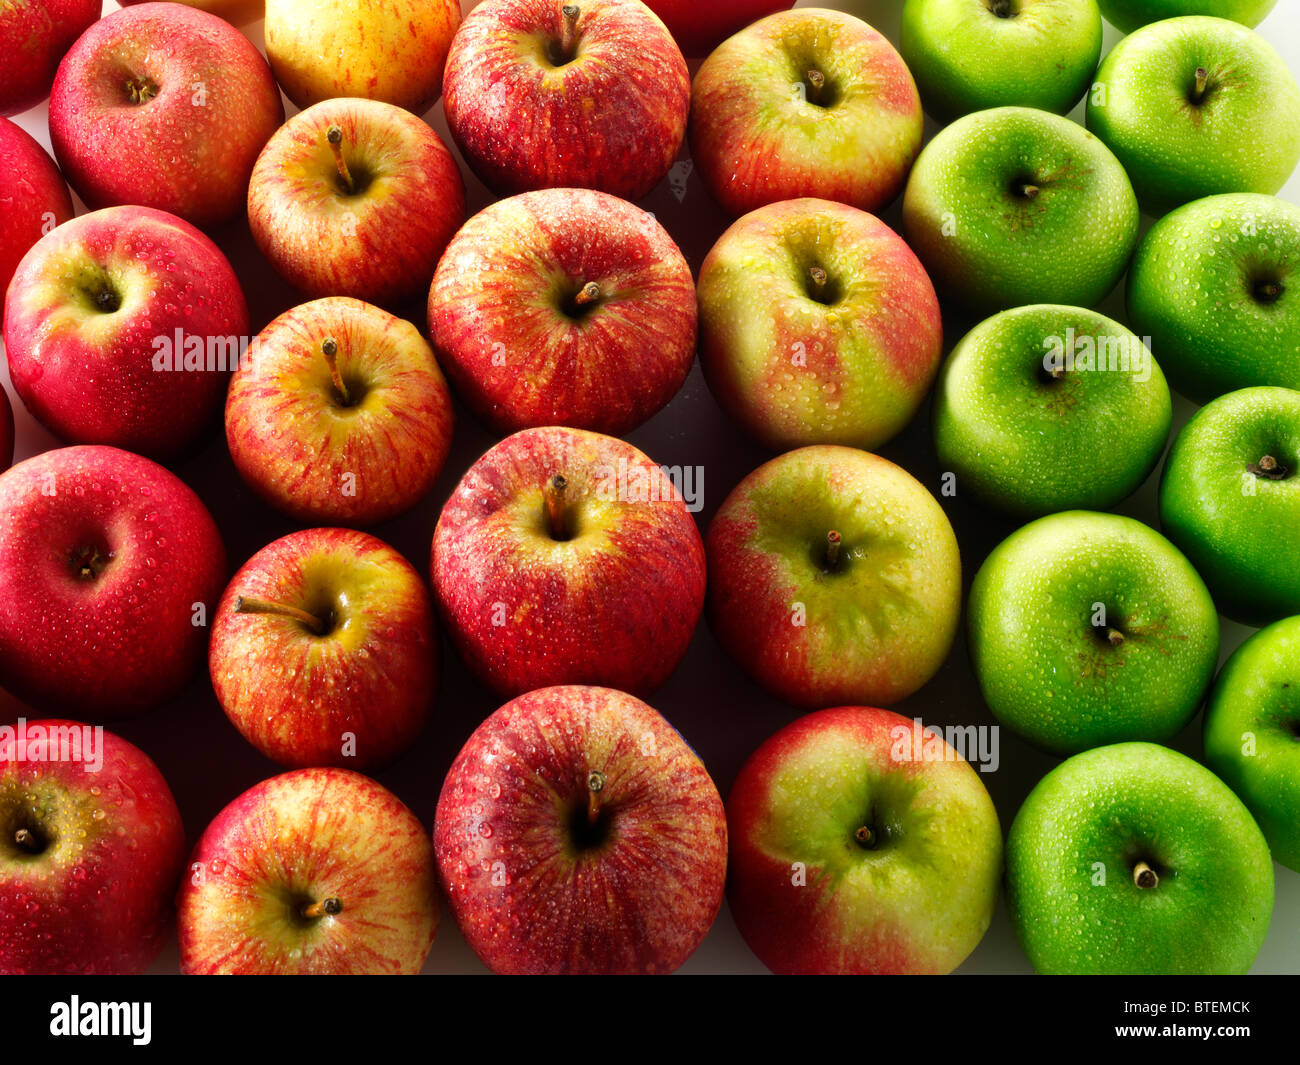 Fresh mixed apples - Stock Image